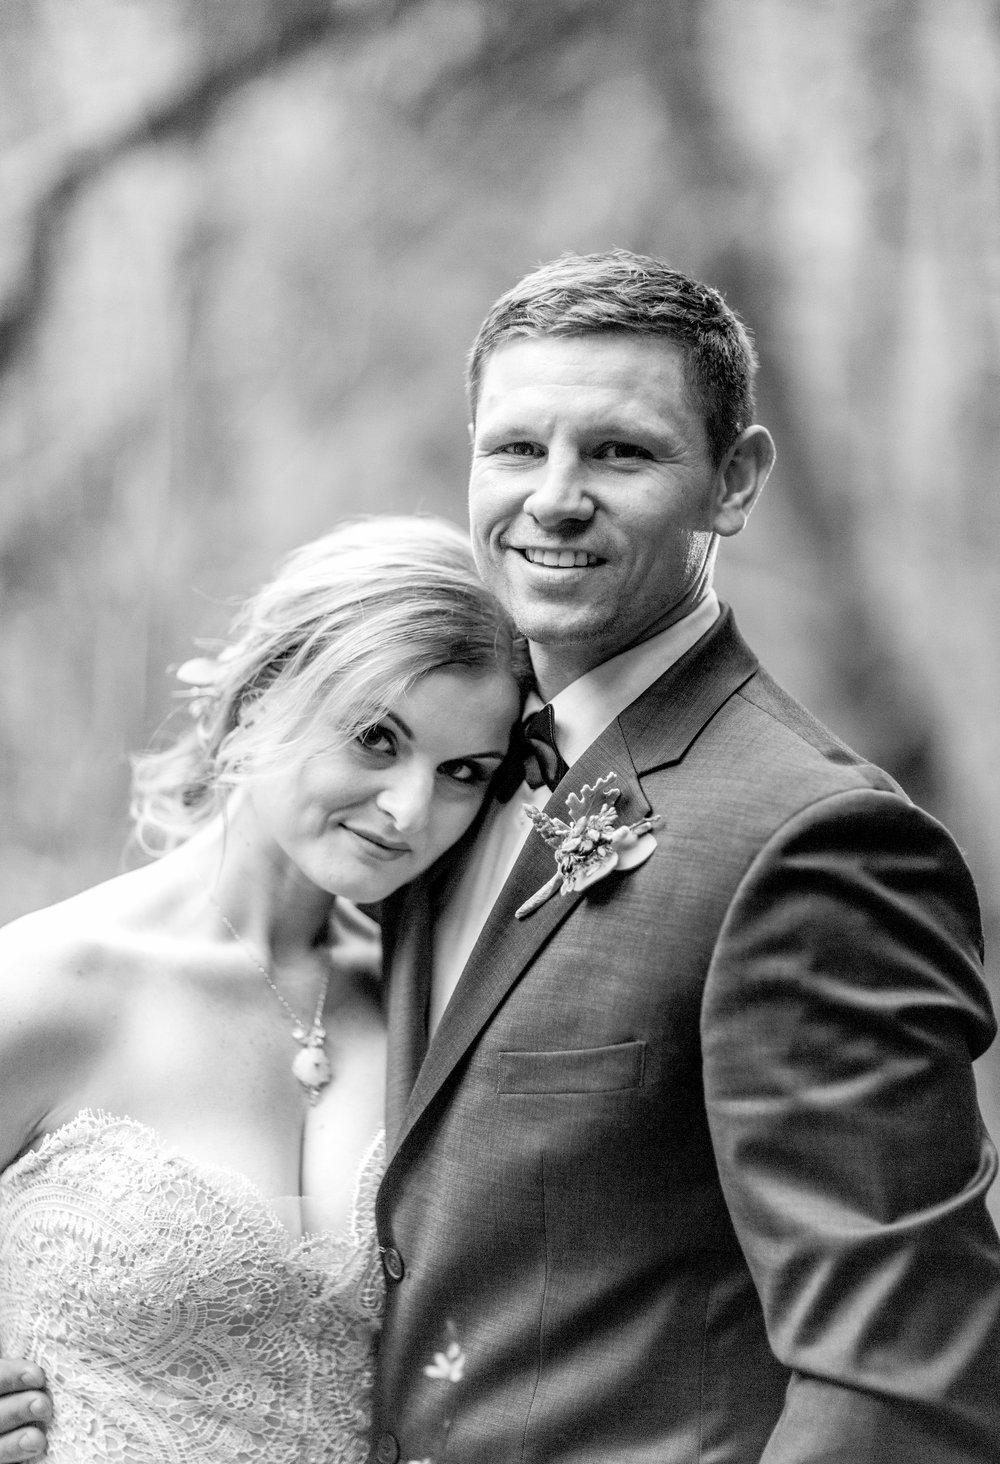 Silver Falls-elopement-bride-and-groom-photo Corina Silva Studios-86.jpg